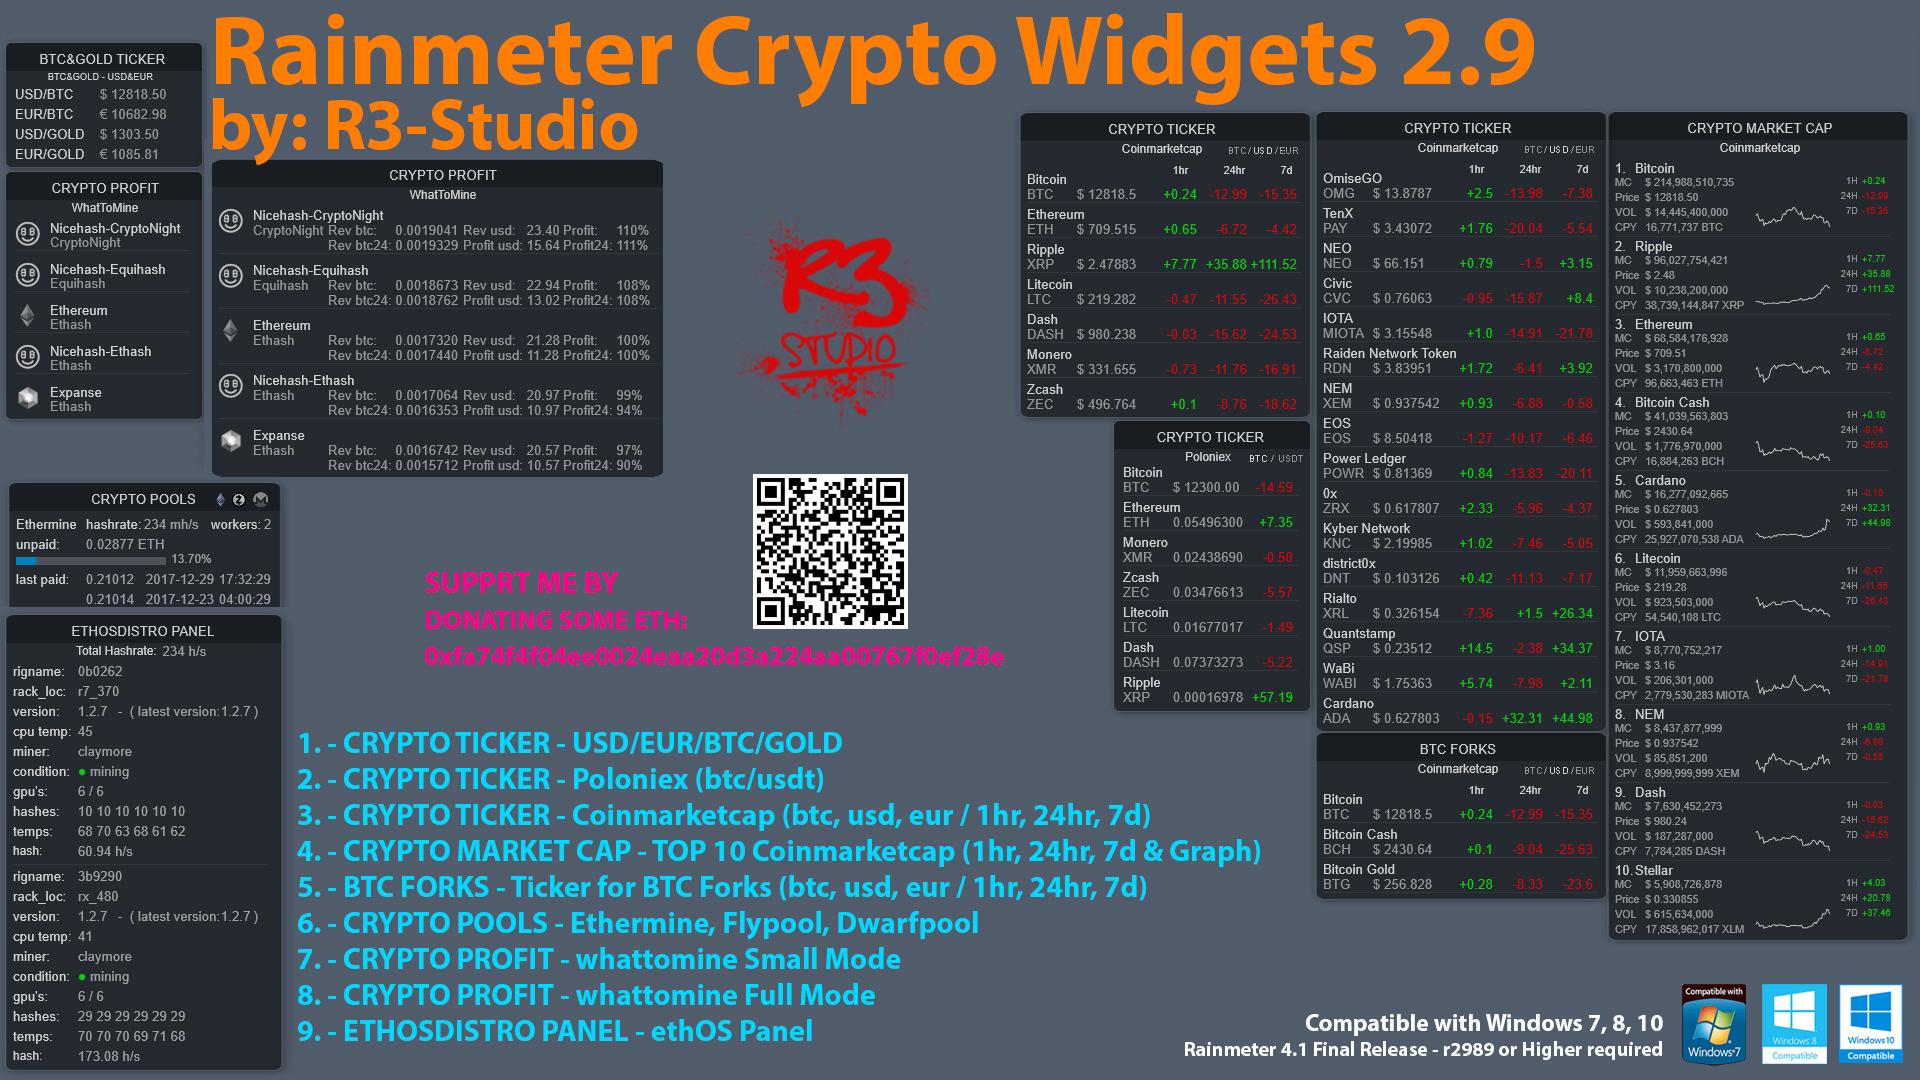 ... R3-Studio Crypto Widgets 2.9 by R3-Studio